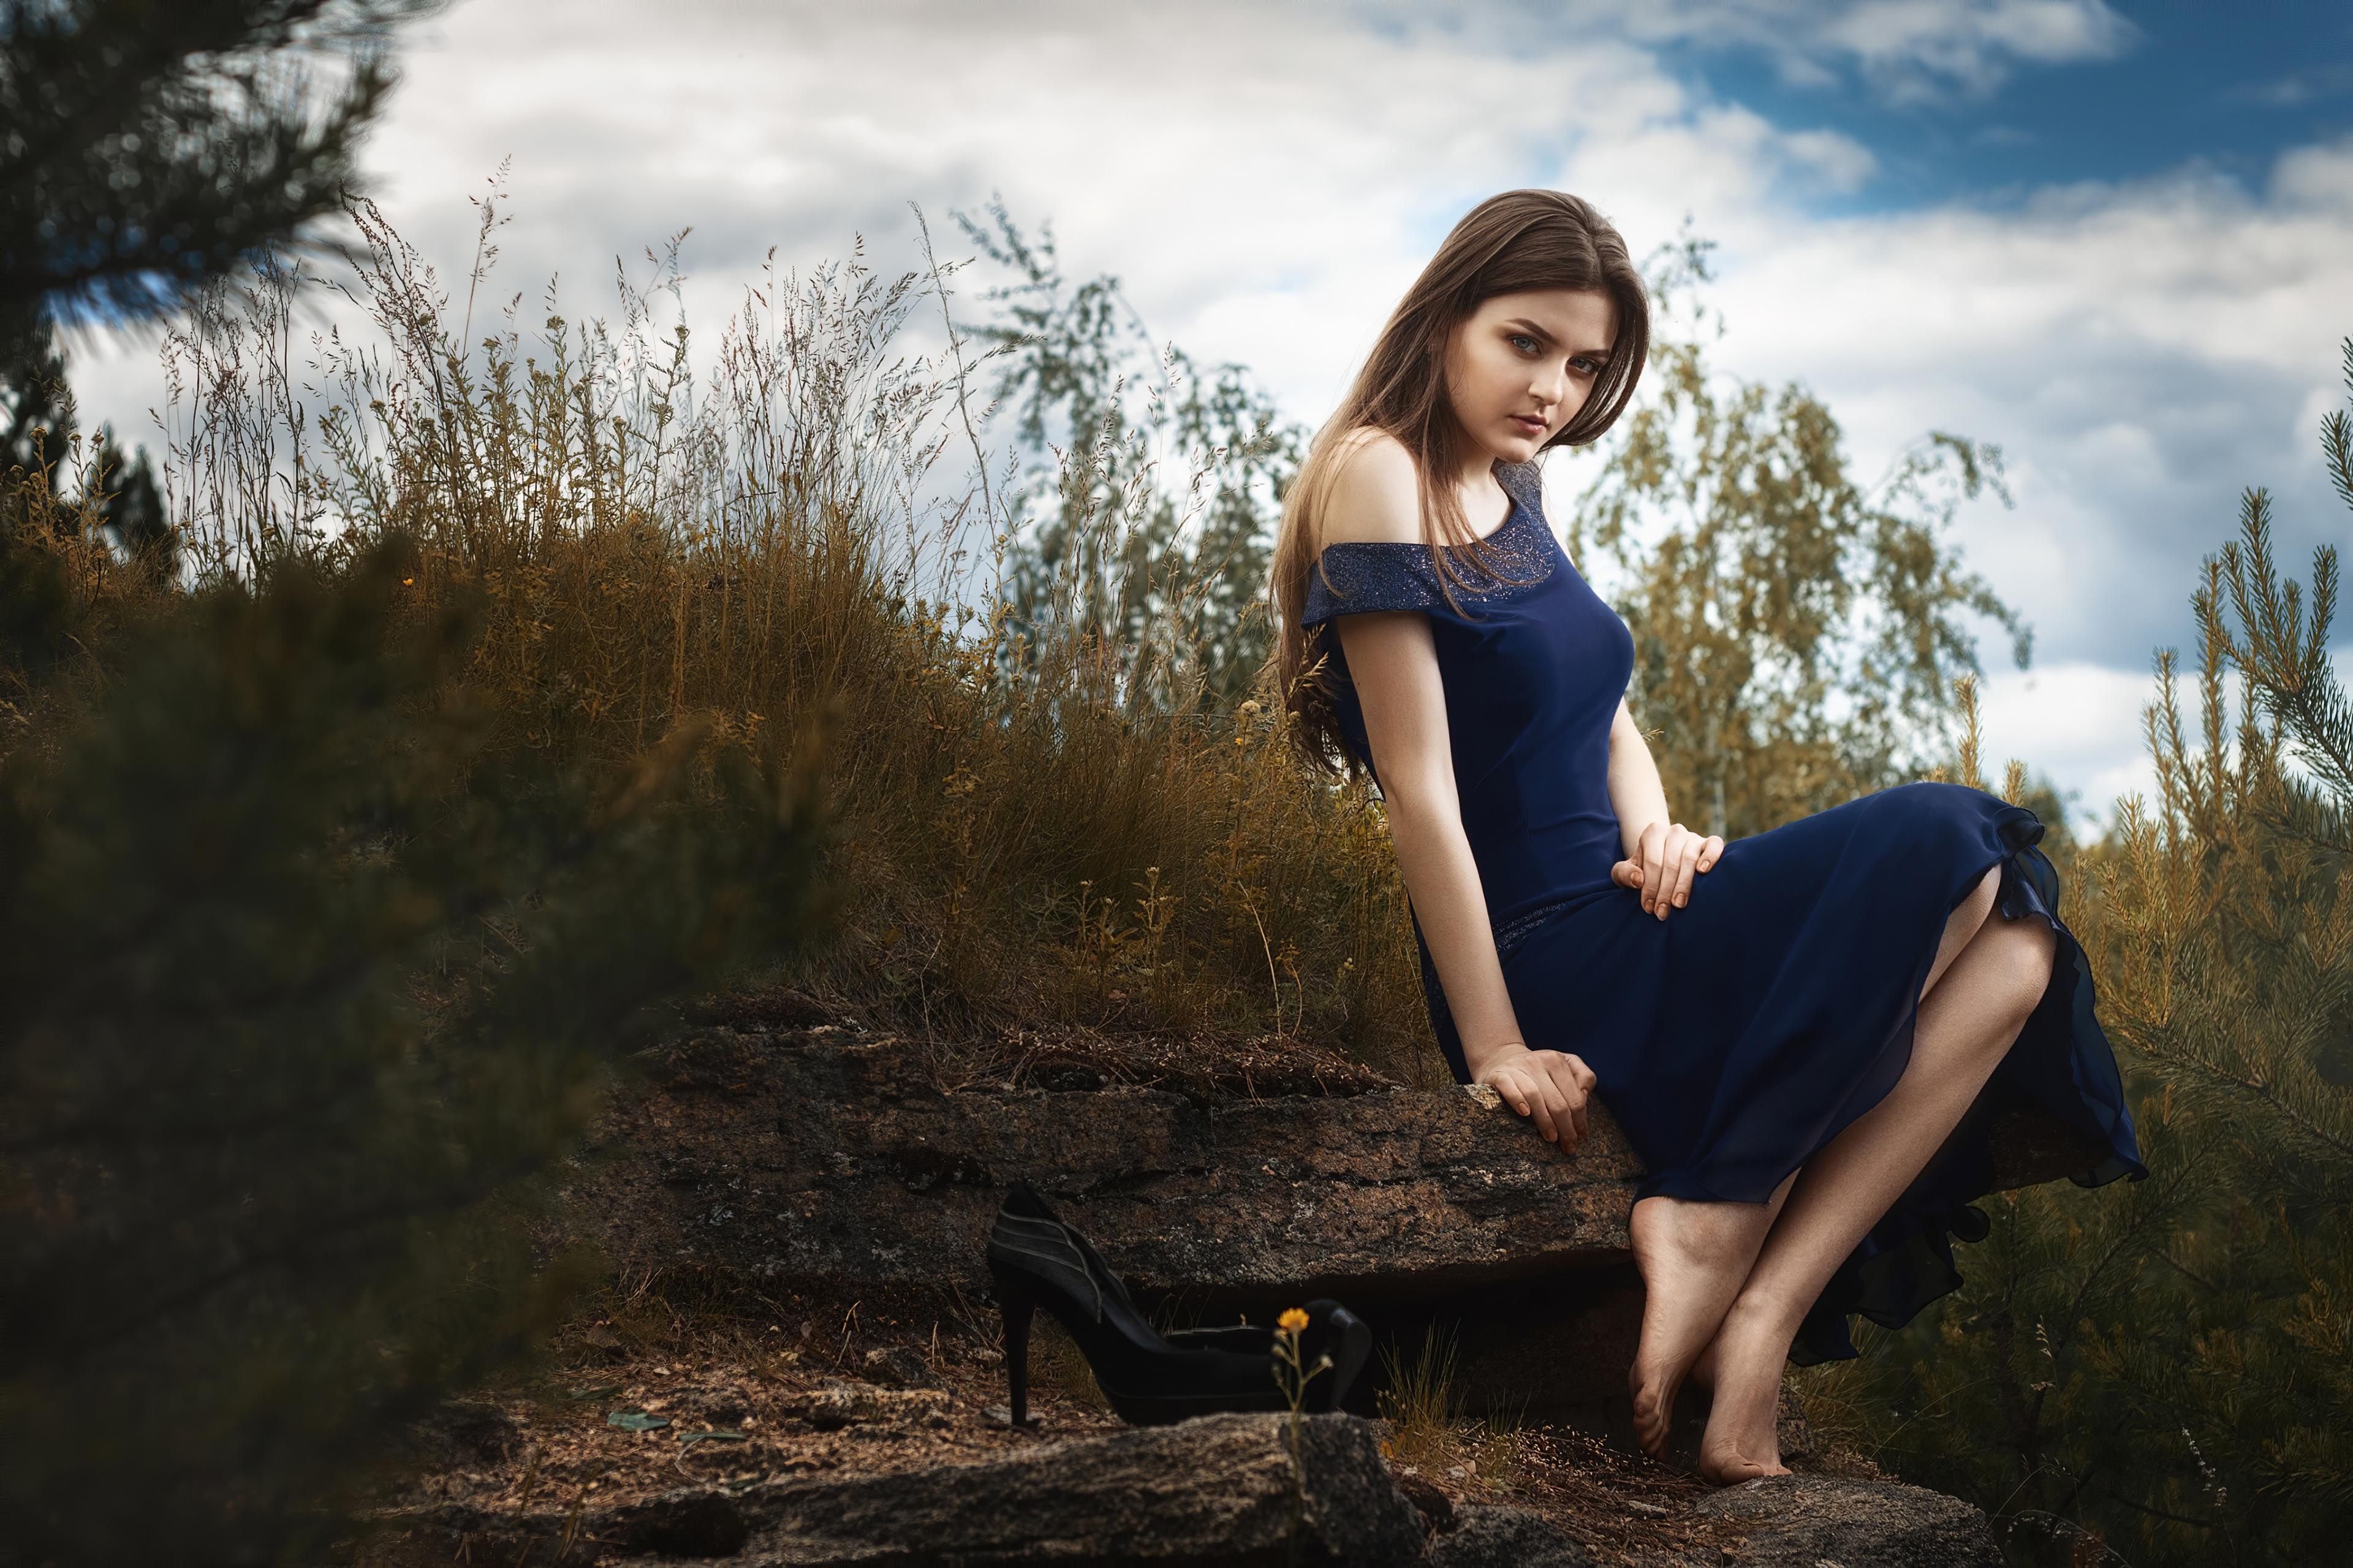 girl in blue dress nature 1575666209 - Girl In Blue Dress Nature -